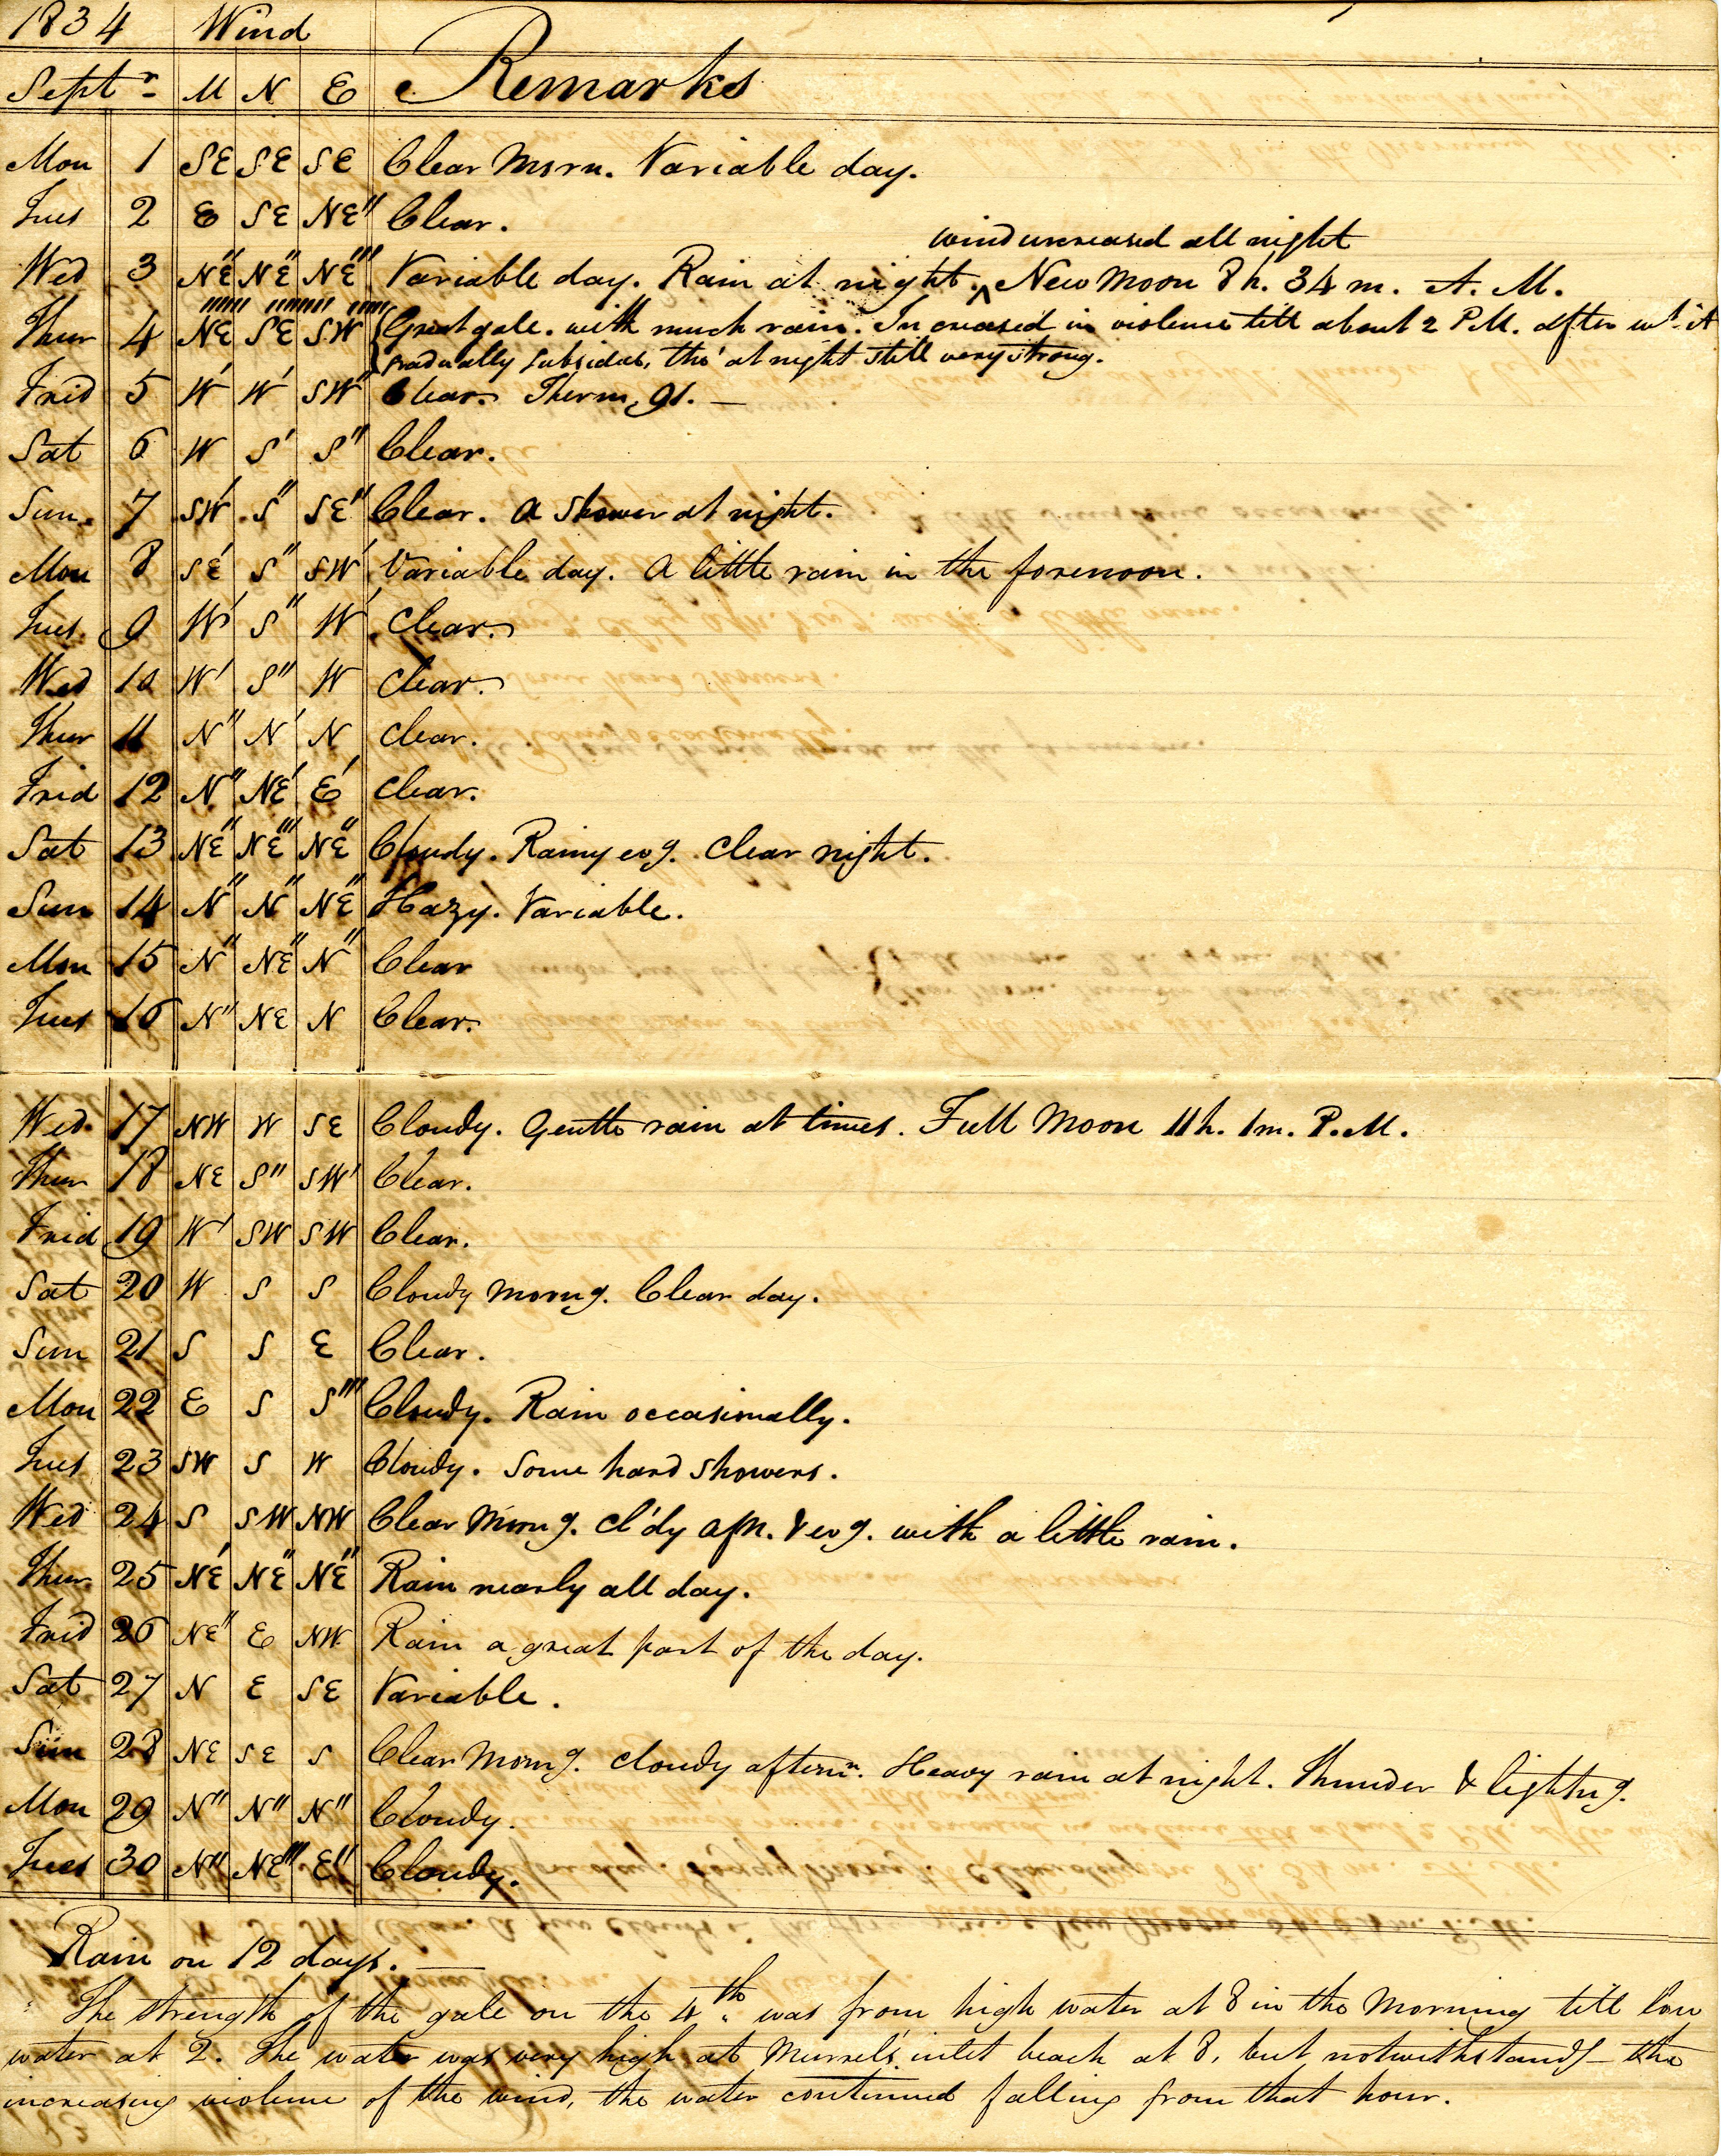 Volume 1: Daily Meteorological Observations, September 1834